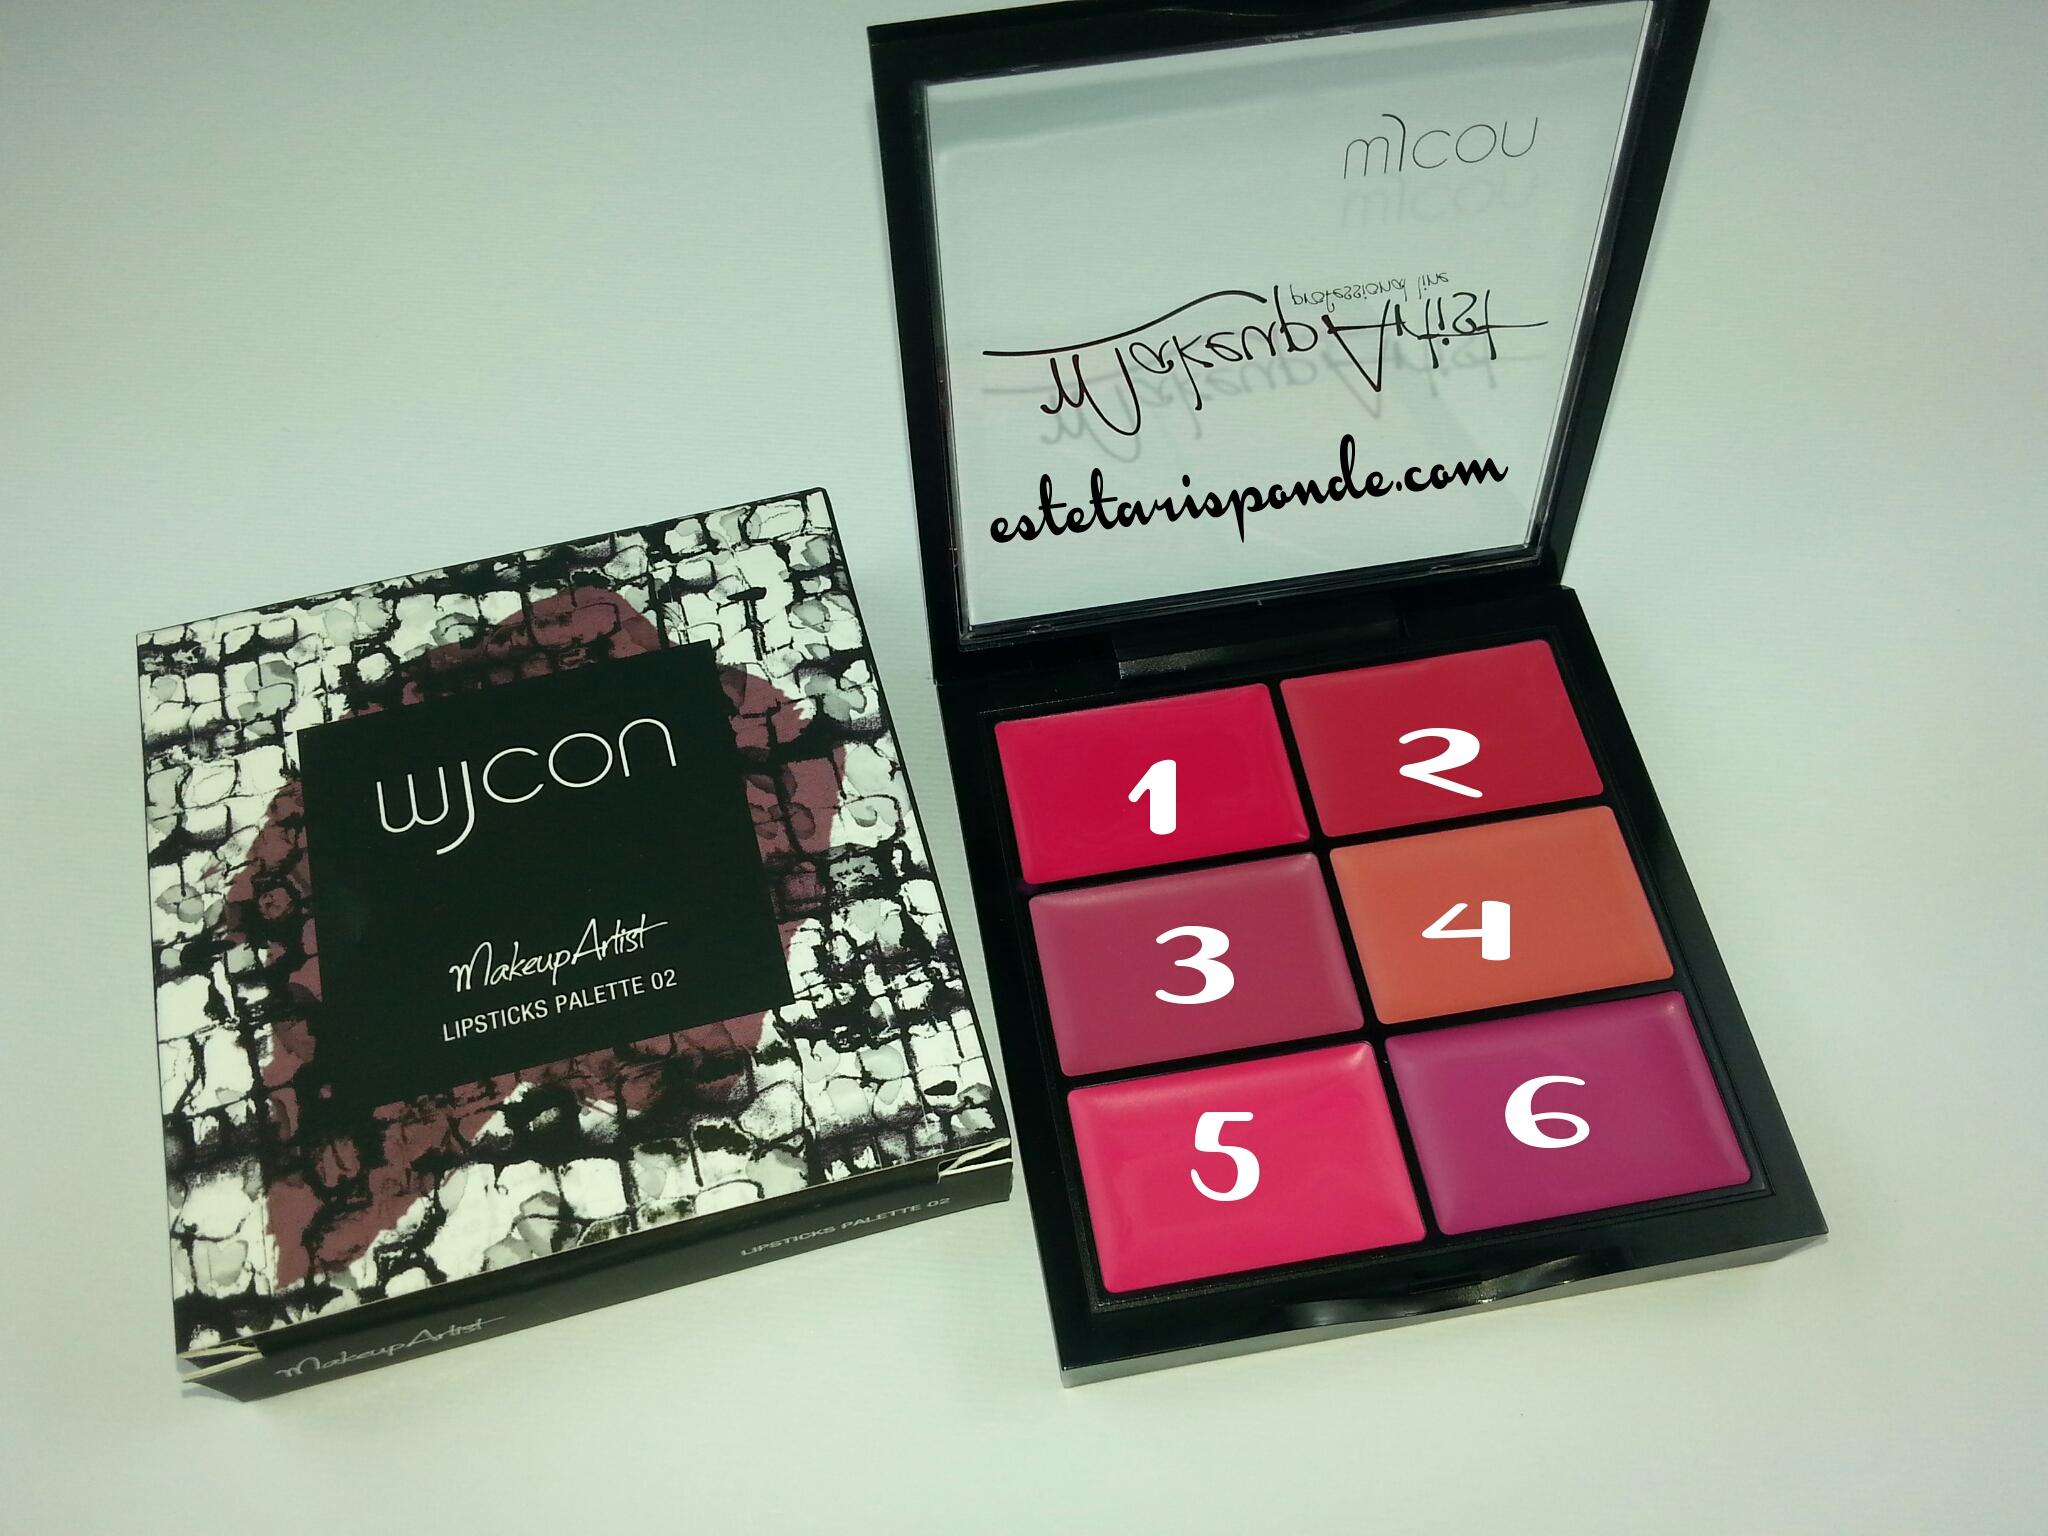 Wjcon Makeup artist collection MakeUp Artist Lipsticks Palette - swatches